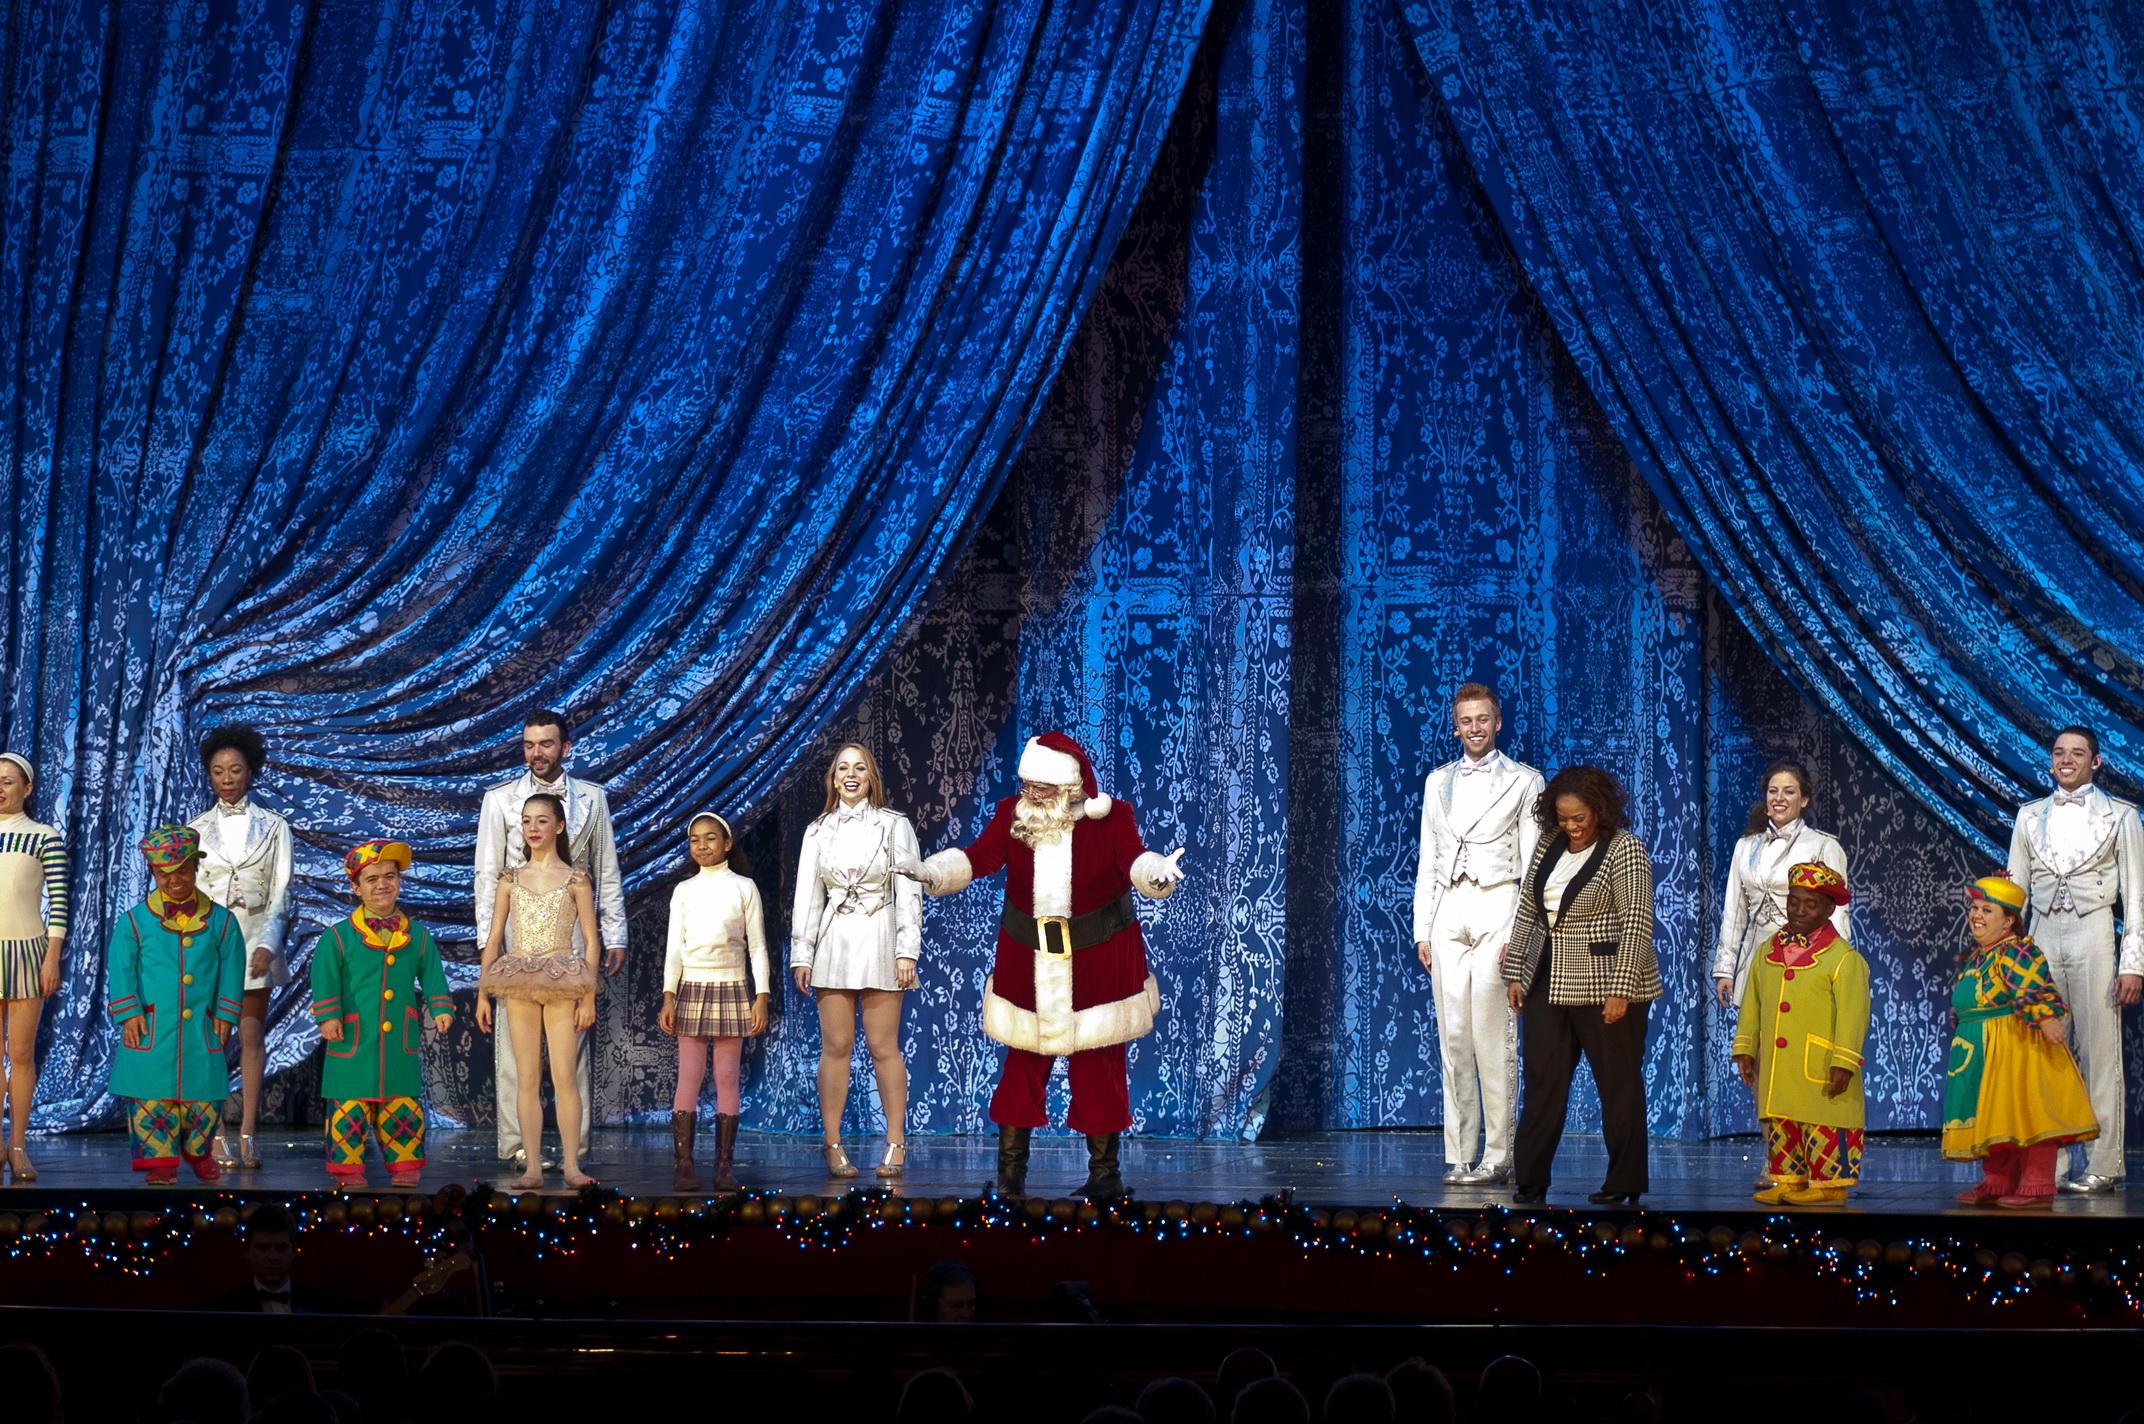 4120_Radio City Music Hall Rockettes show